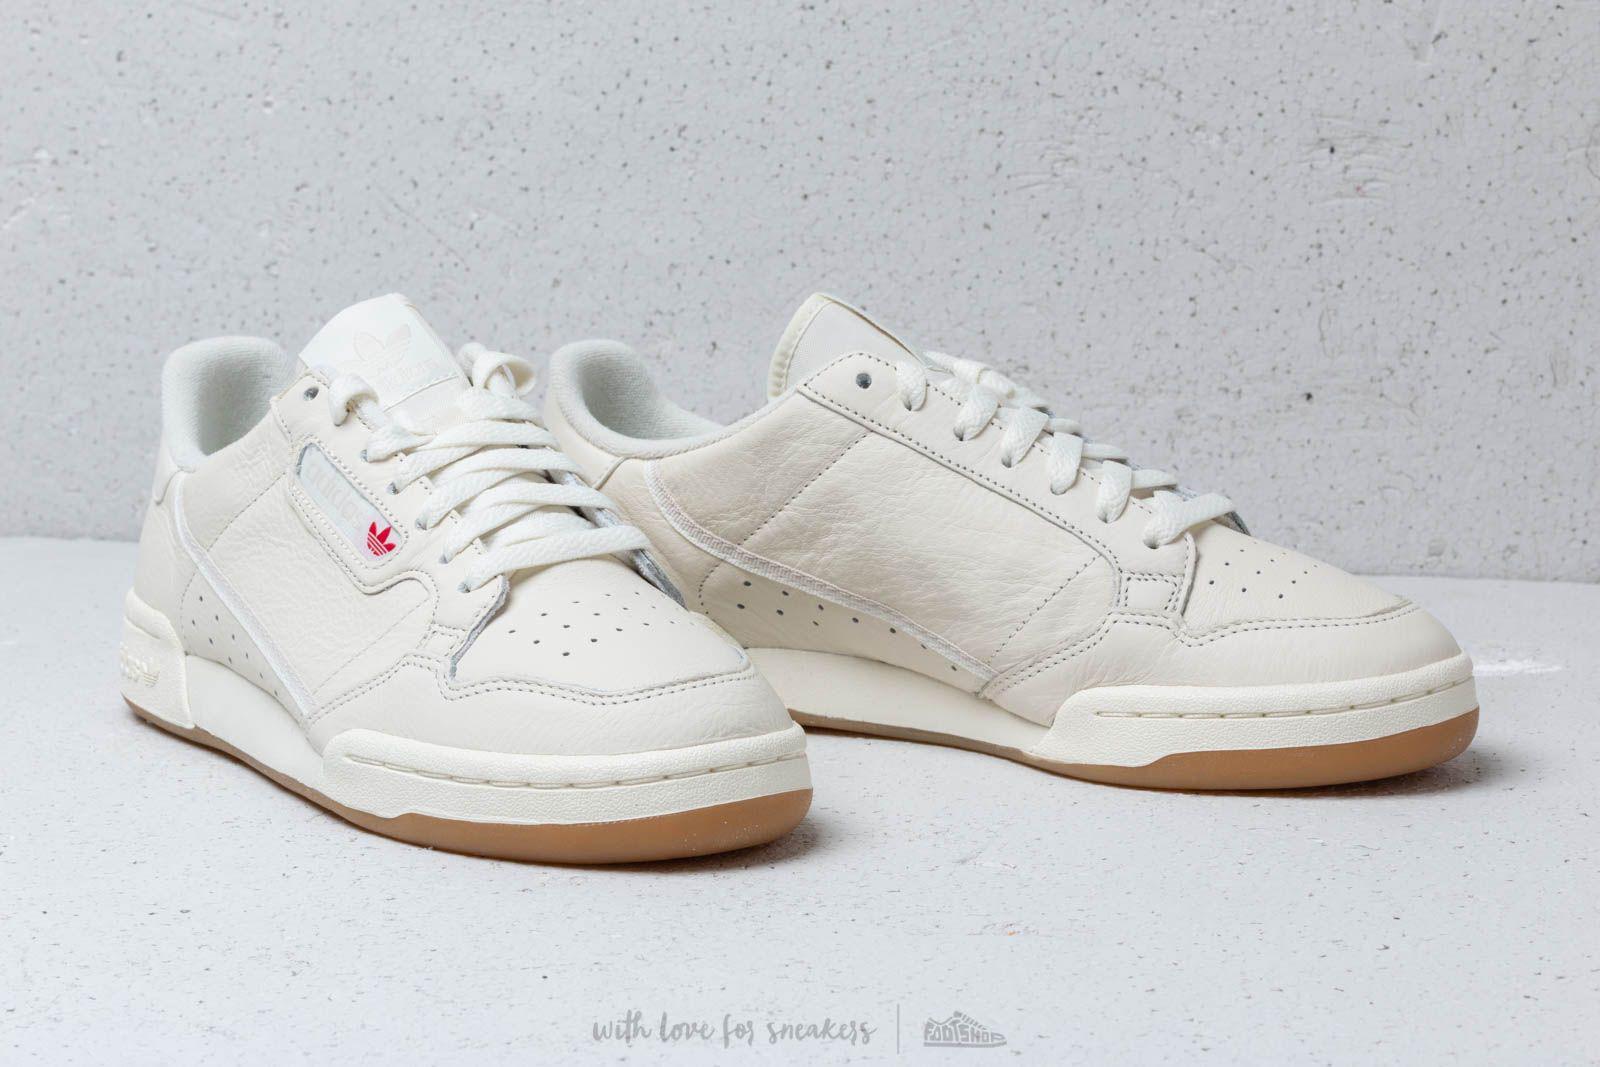 Adidas Originals - Adidas Continental 80 Off White  Raw White  Gum for Men  -. View fullscreen c4593e57d